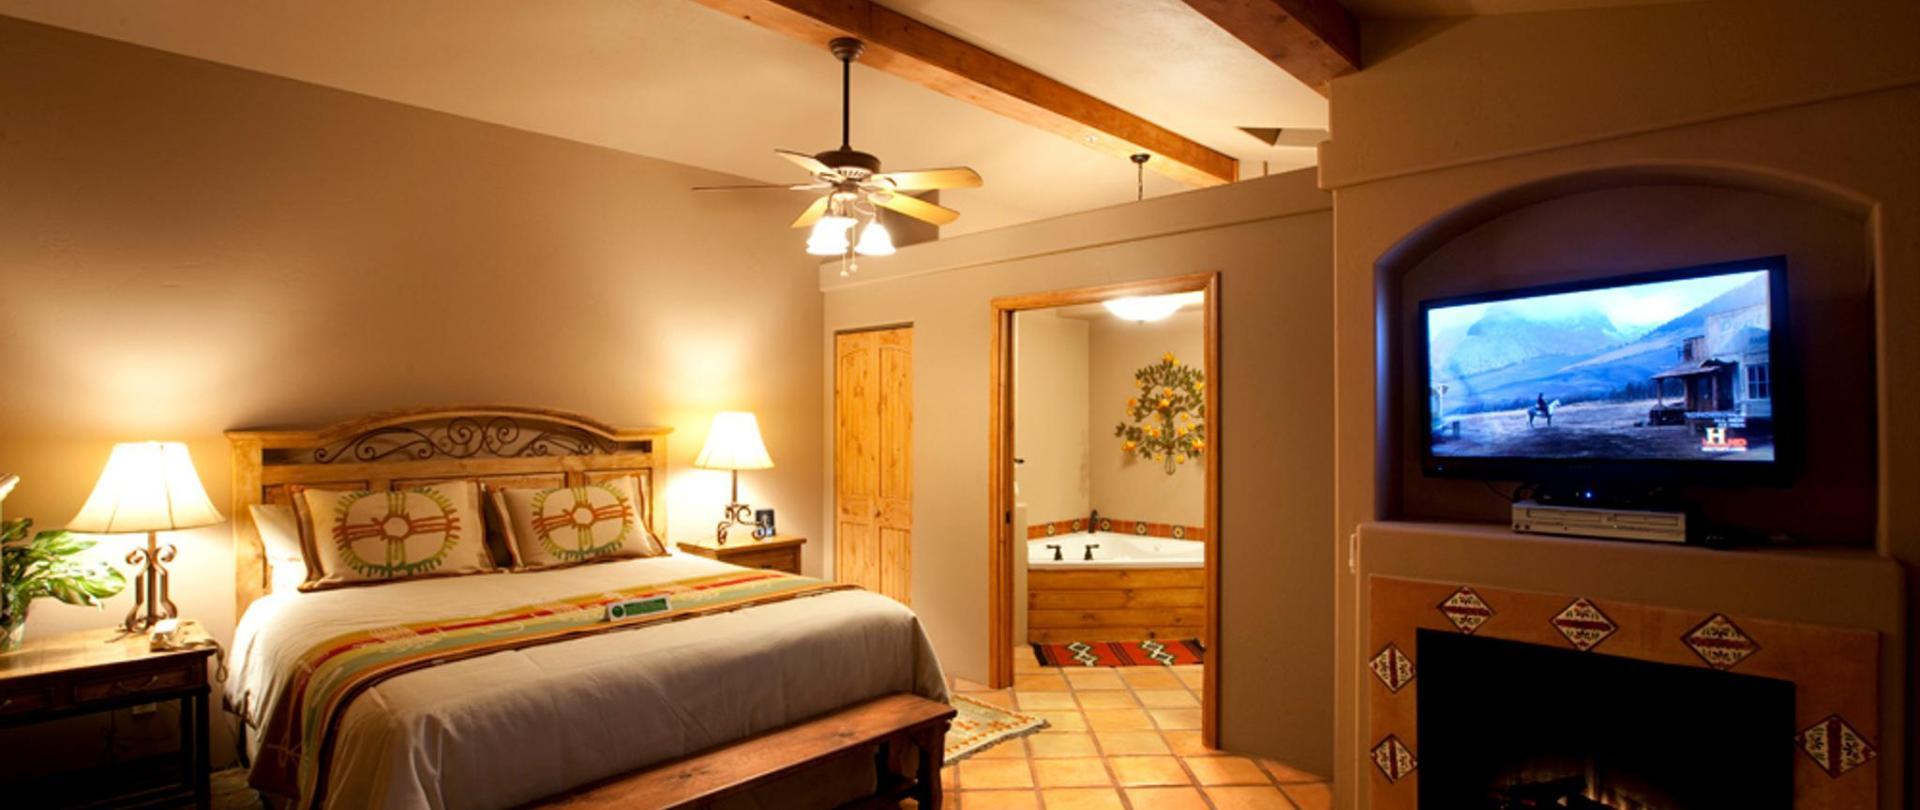 Adobe Hacienda Bed U0026 Breakfast